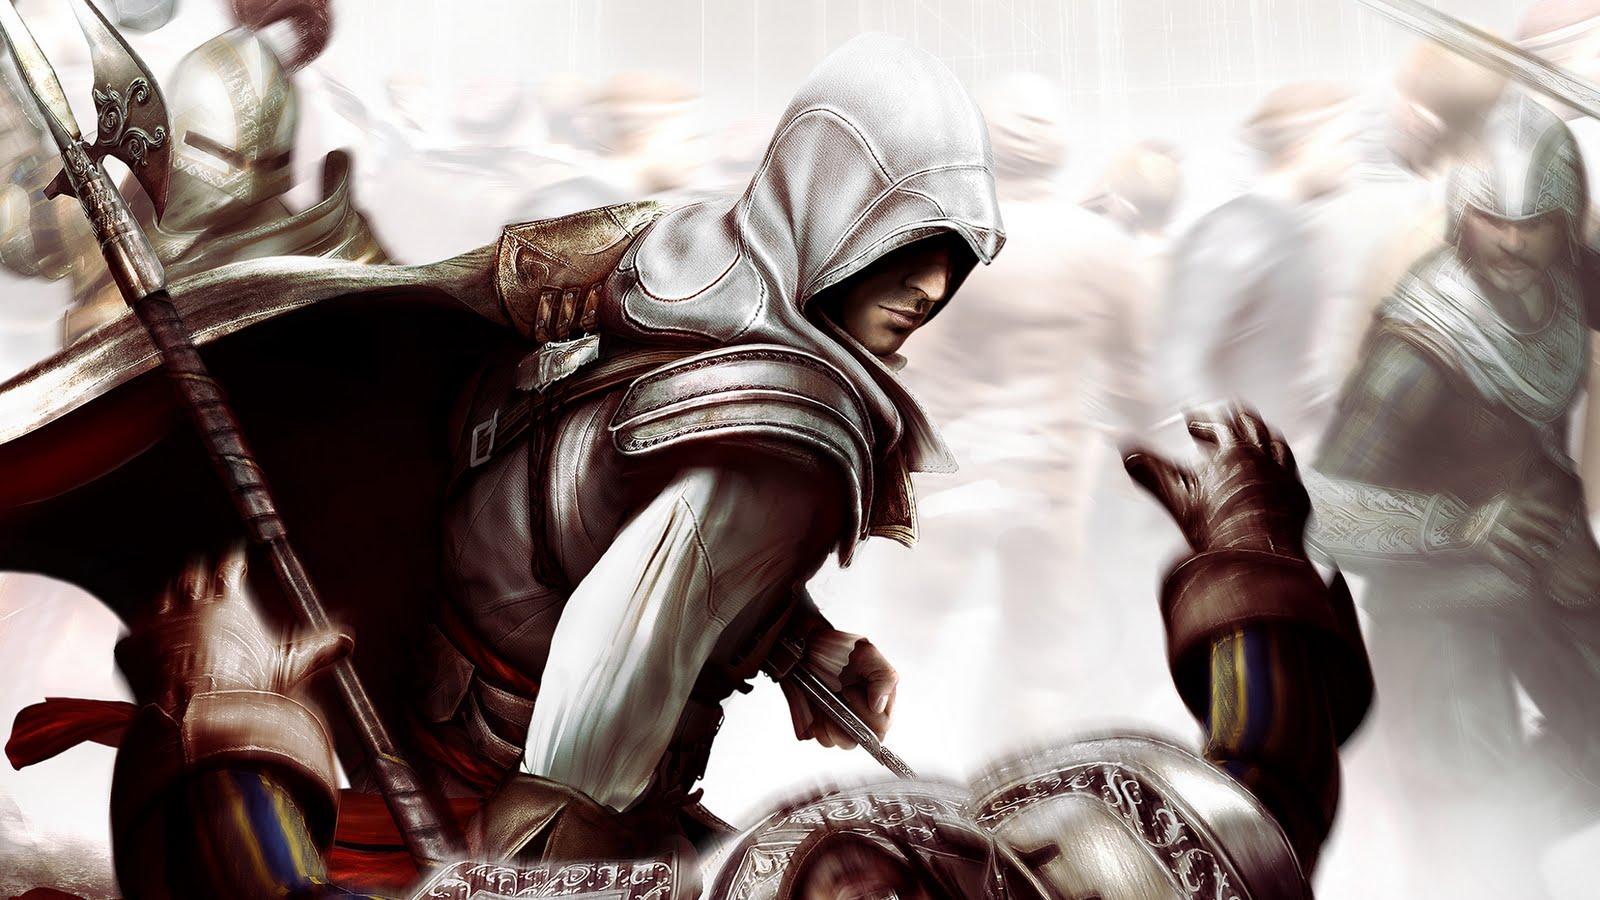 http://3.bp.blogspot.com/_3VnbSvbL2tE/TCDbLgUysAI/AAAAAAAAAUY/fa-kvLk02f0/s1600/.....Assassins-Creed-2-wallpaper1.bmp